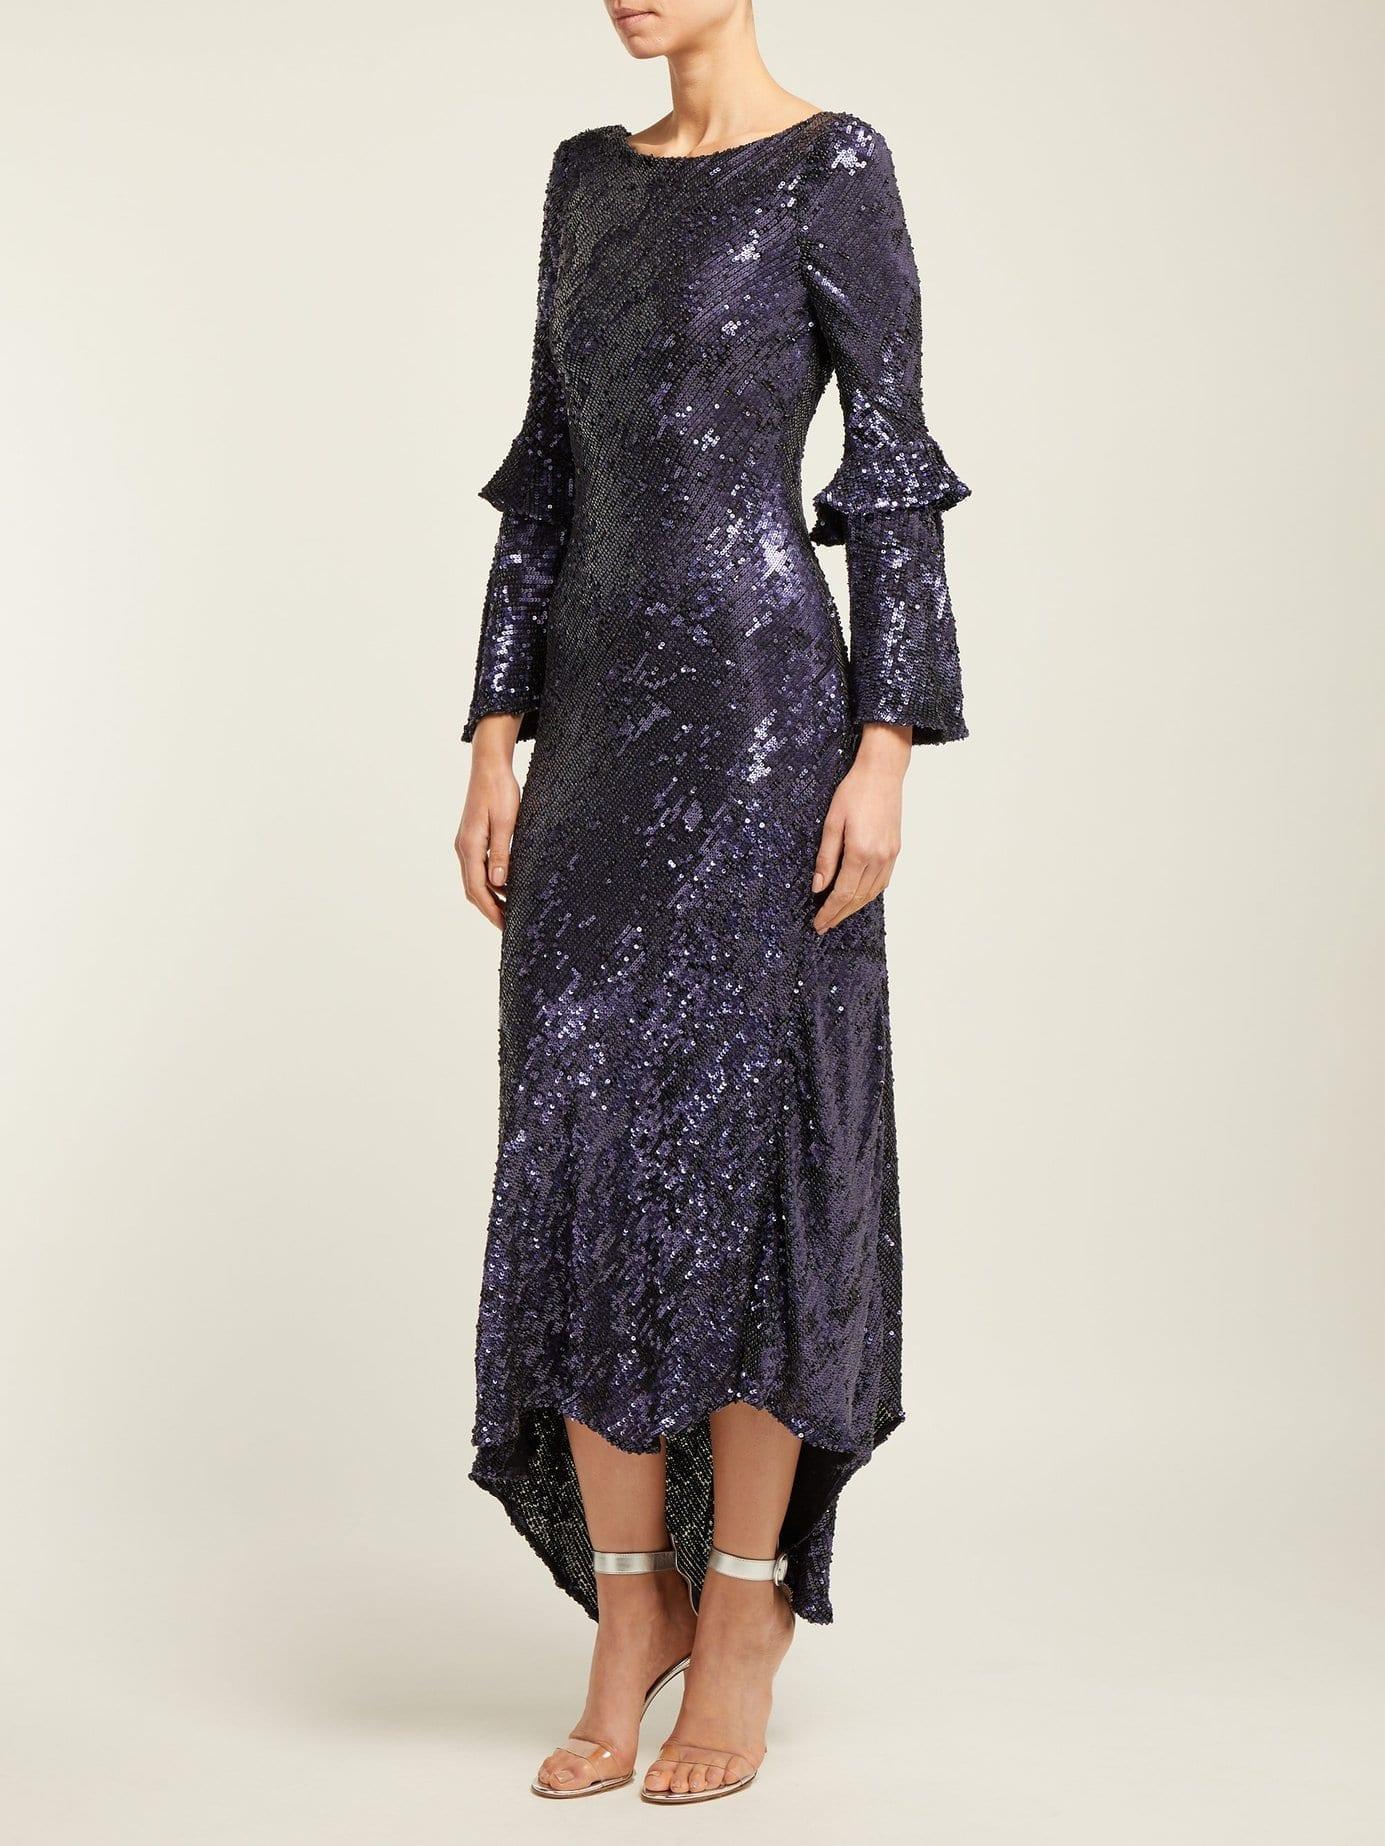 MARIA LUCIA HOHAN Polina Sequinned Chiffon Purple Dress